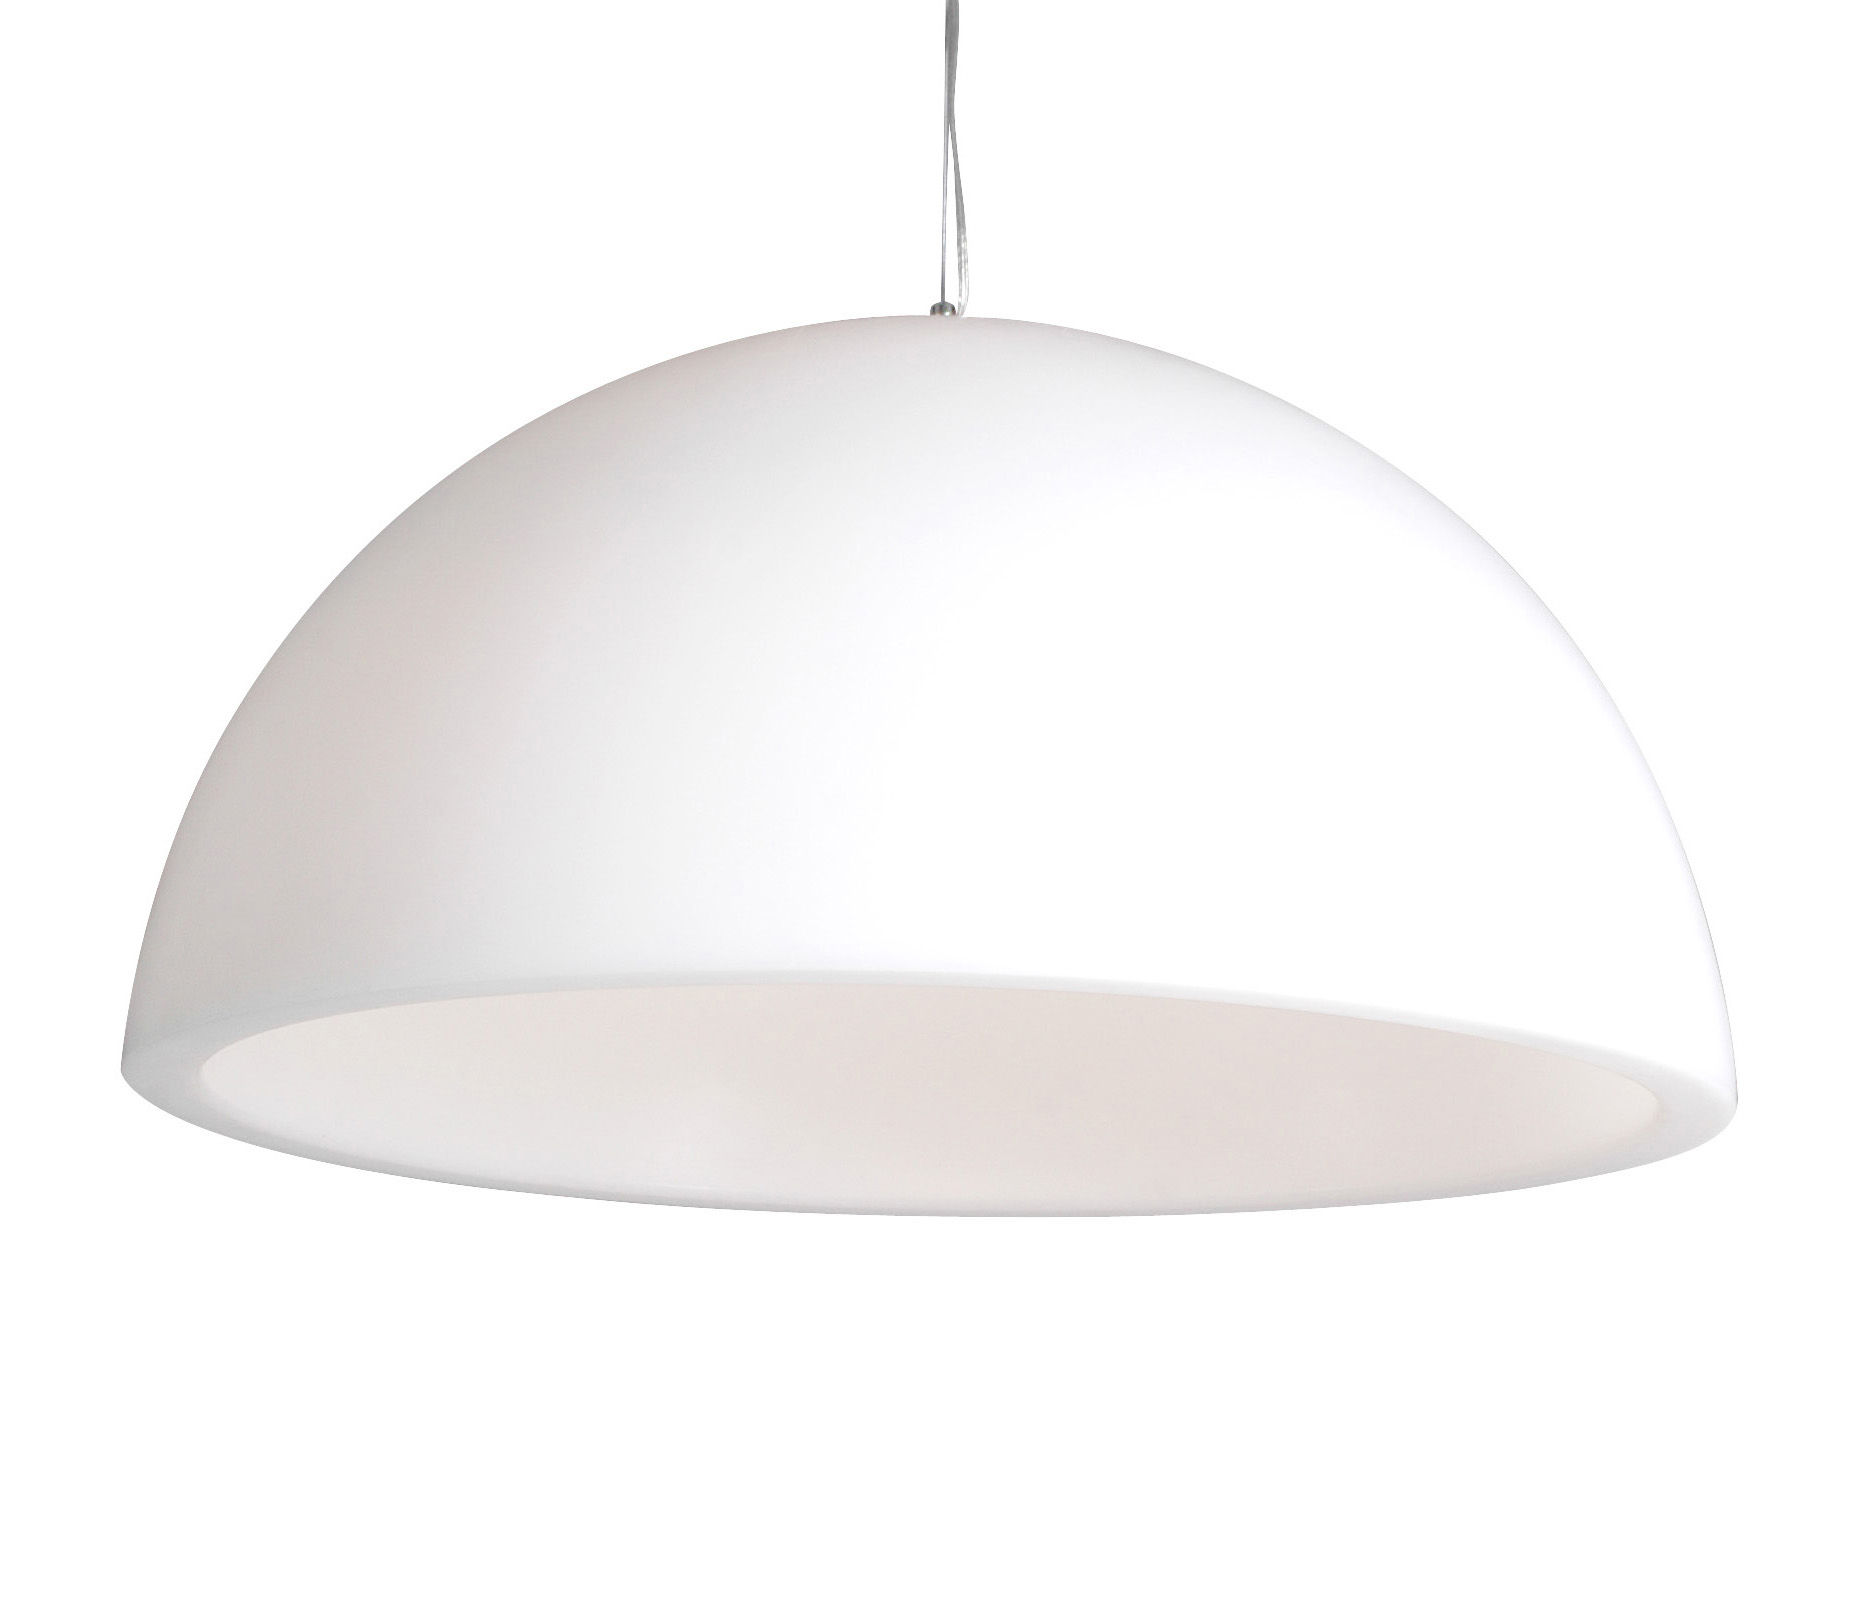 Illuminazione - Lampadari - Sospensione Cupole - Ø 80 cm di Slide - Bianco - polietilene riciclabile